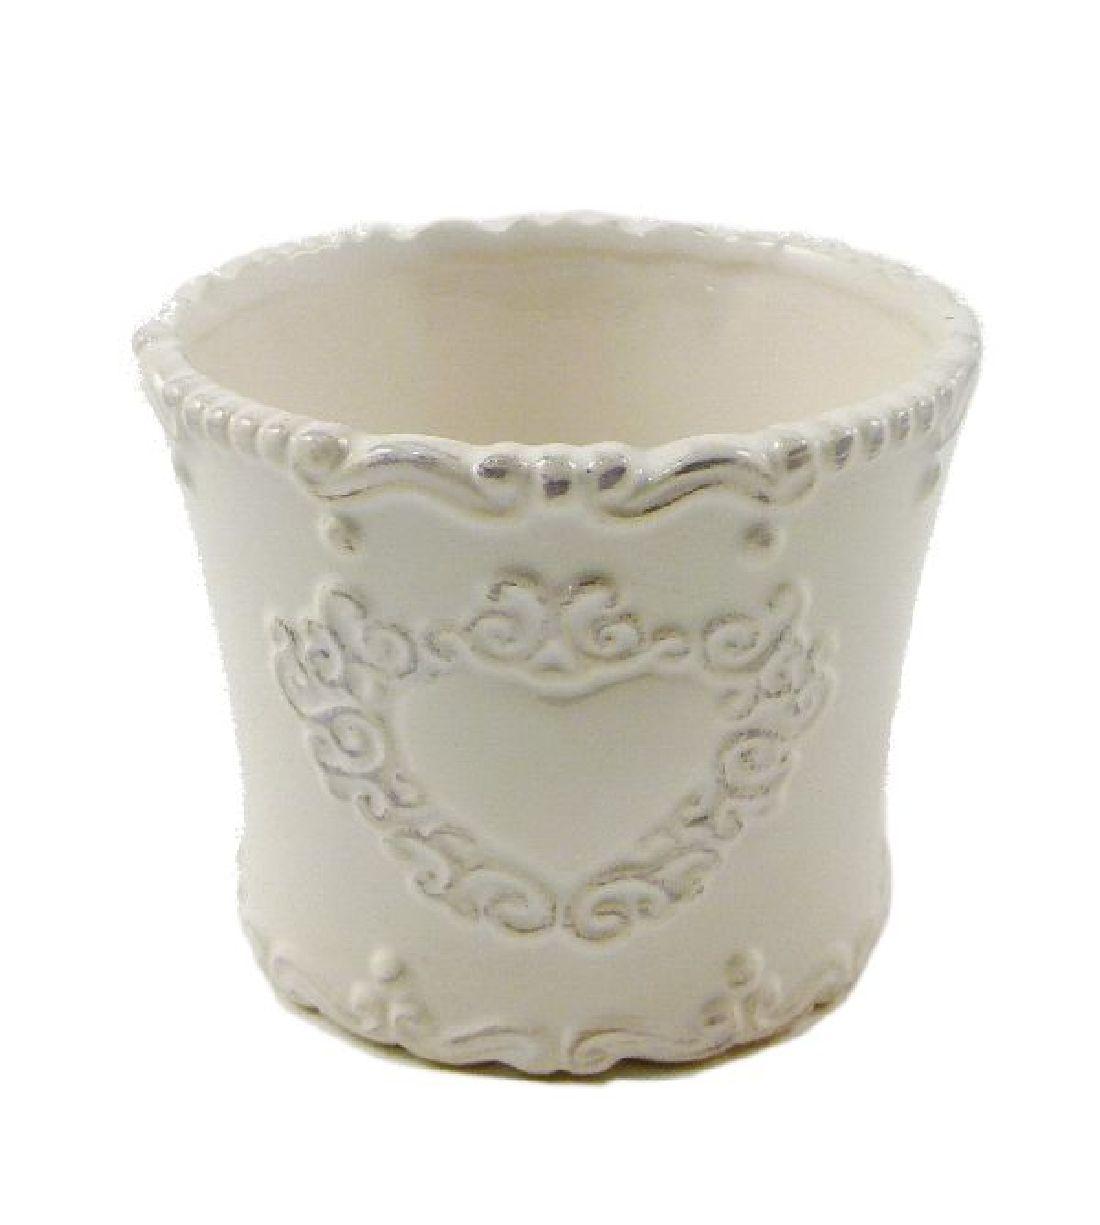 Keramik Topf Sweetheart CREME-GLASIERT rund 10,5x8,5cm 44319